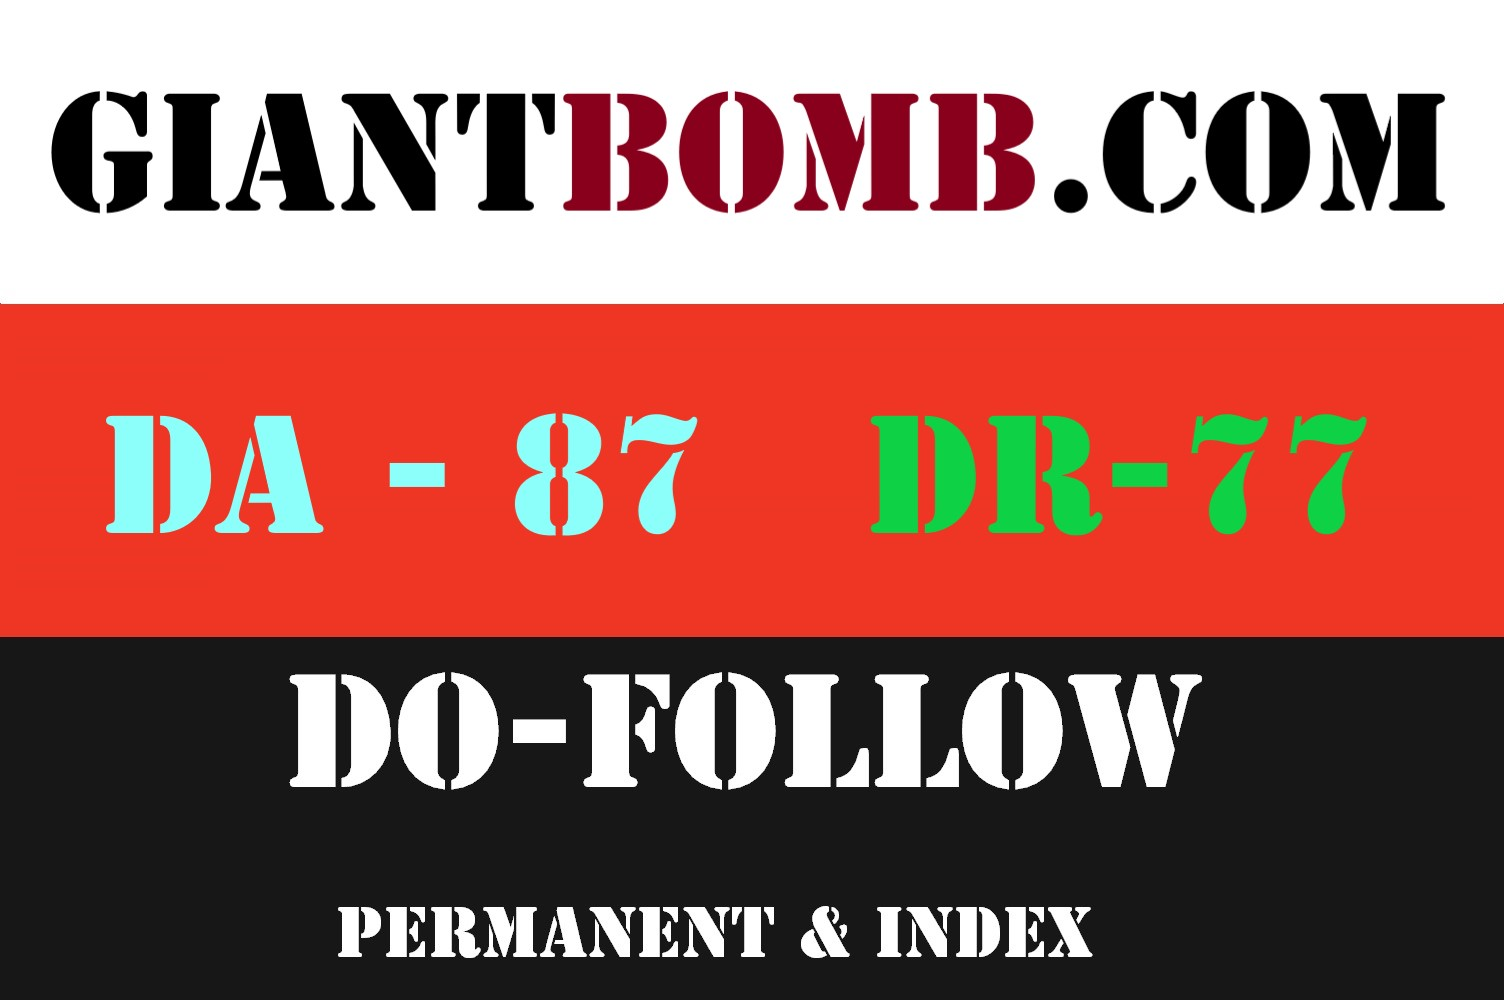 Publish a guest post on Giant bomb - Giantbomb. com - DA87,  DR77